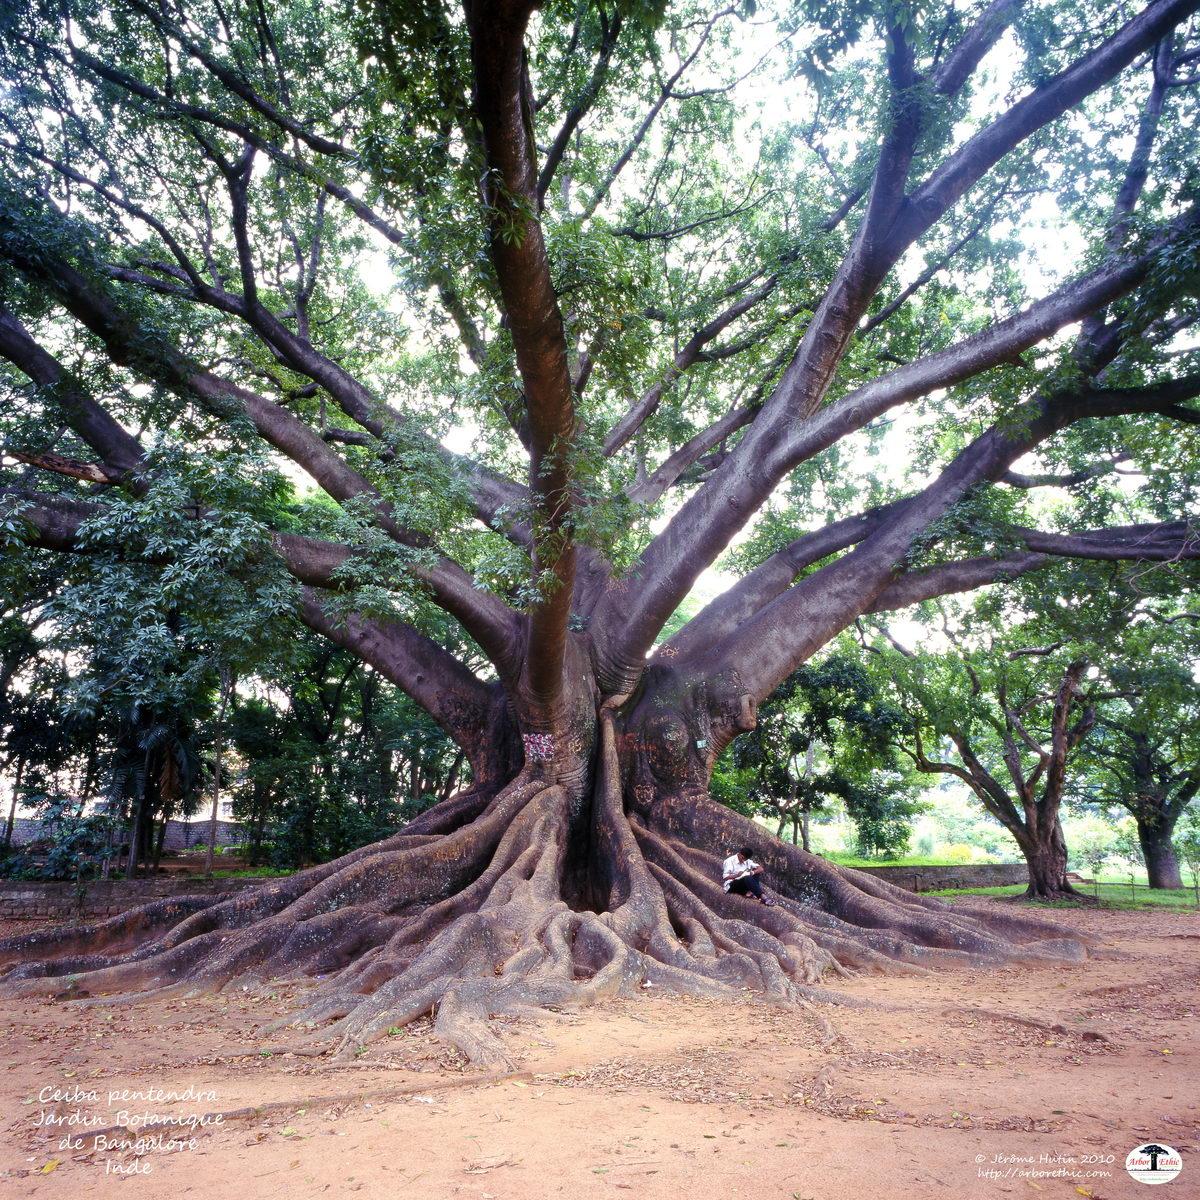 monde_inde_ceiba_pentendra_bangalore_072